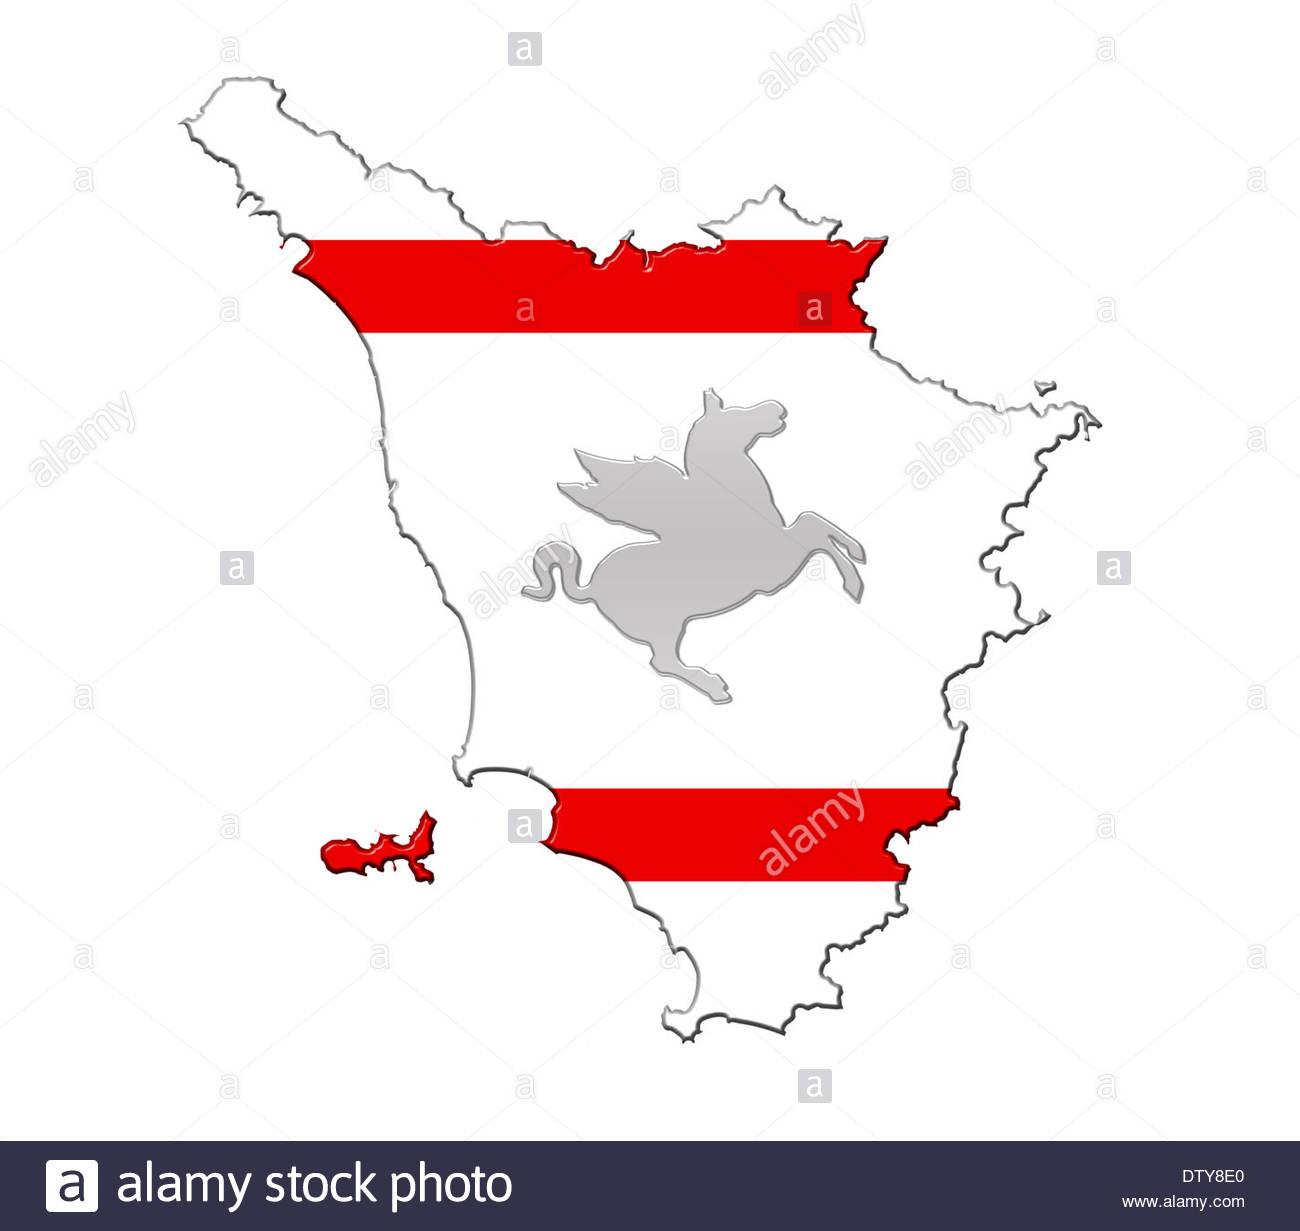 Italy Tuscany flag map banner Toscana Stock Photo: 66982216 - Alamy